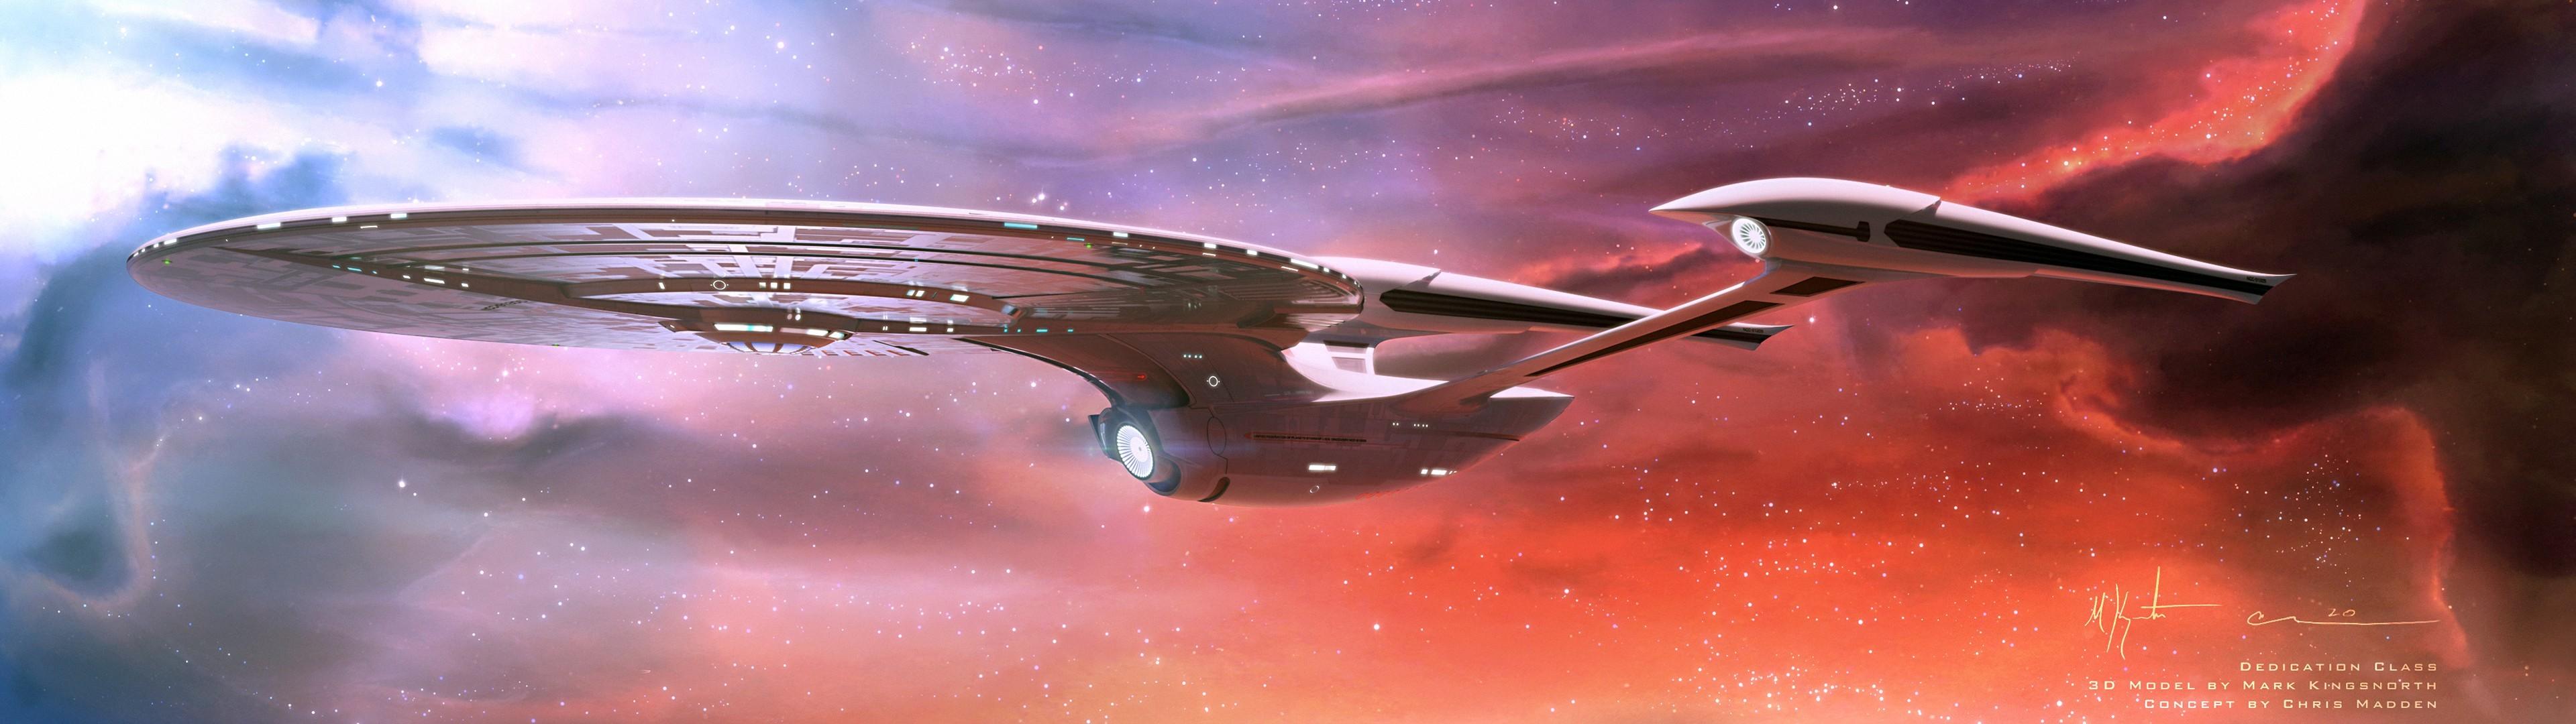 104 Dual Monitor Star Trek